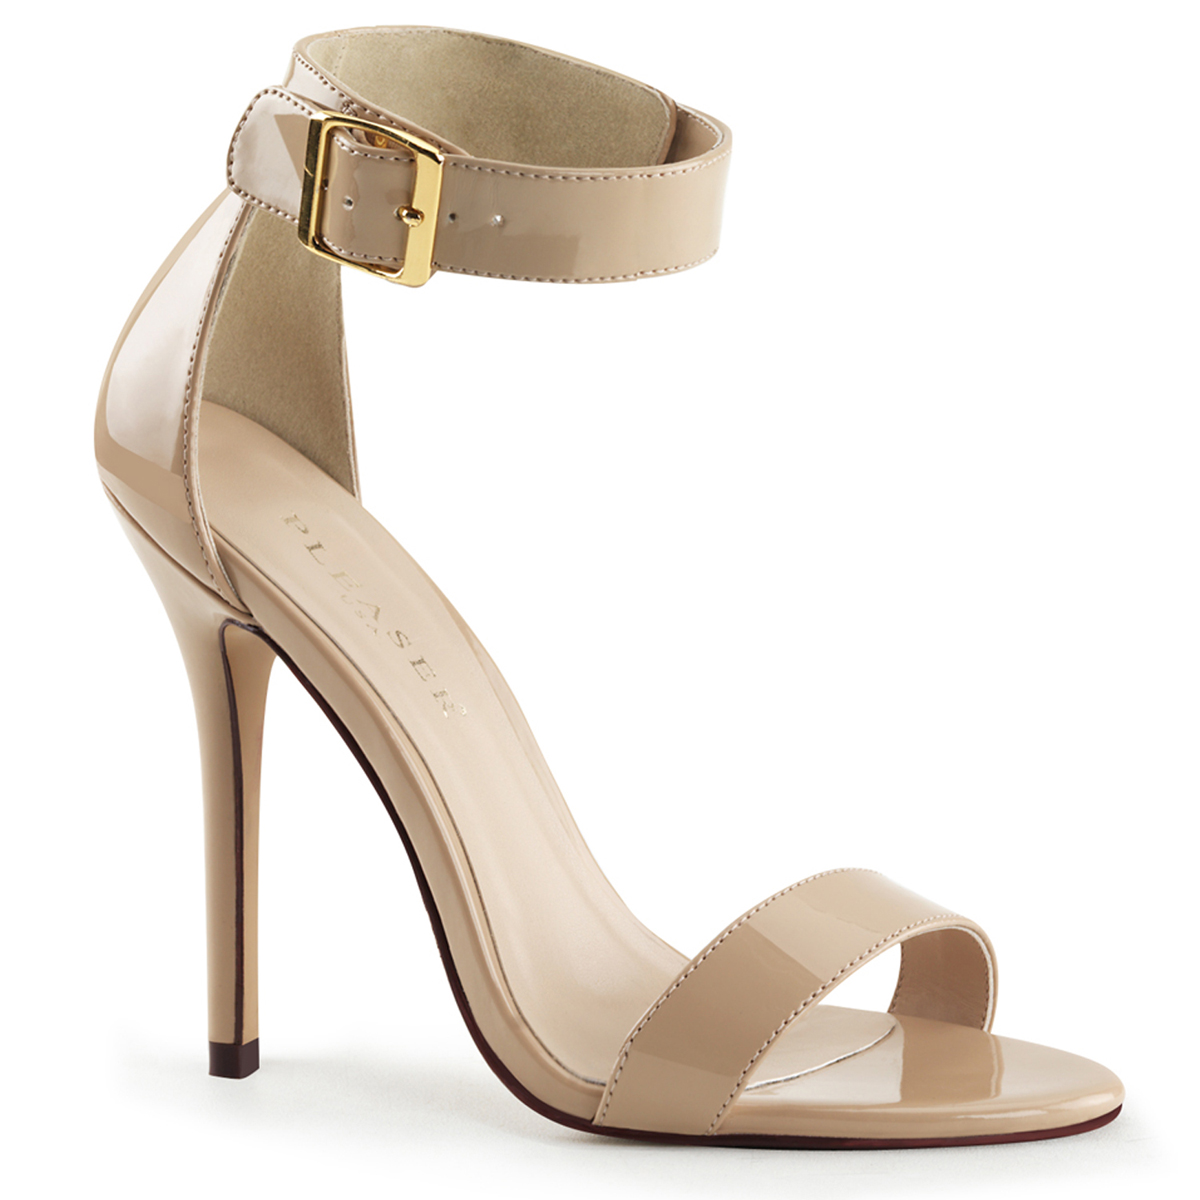 PLEASER Stiletto High Heels Open Toe Closed Back Patent Sandals AMUSE-15 Black